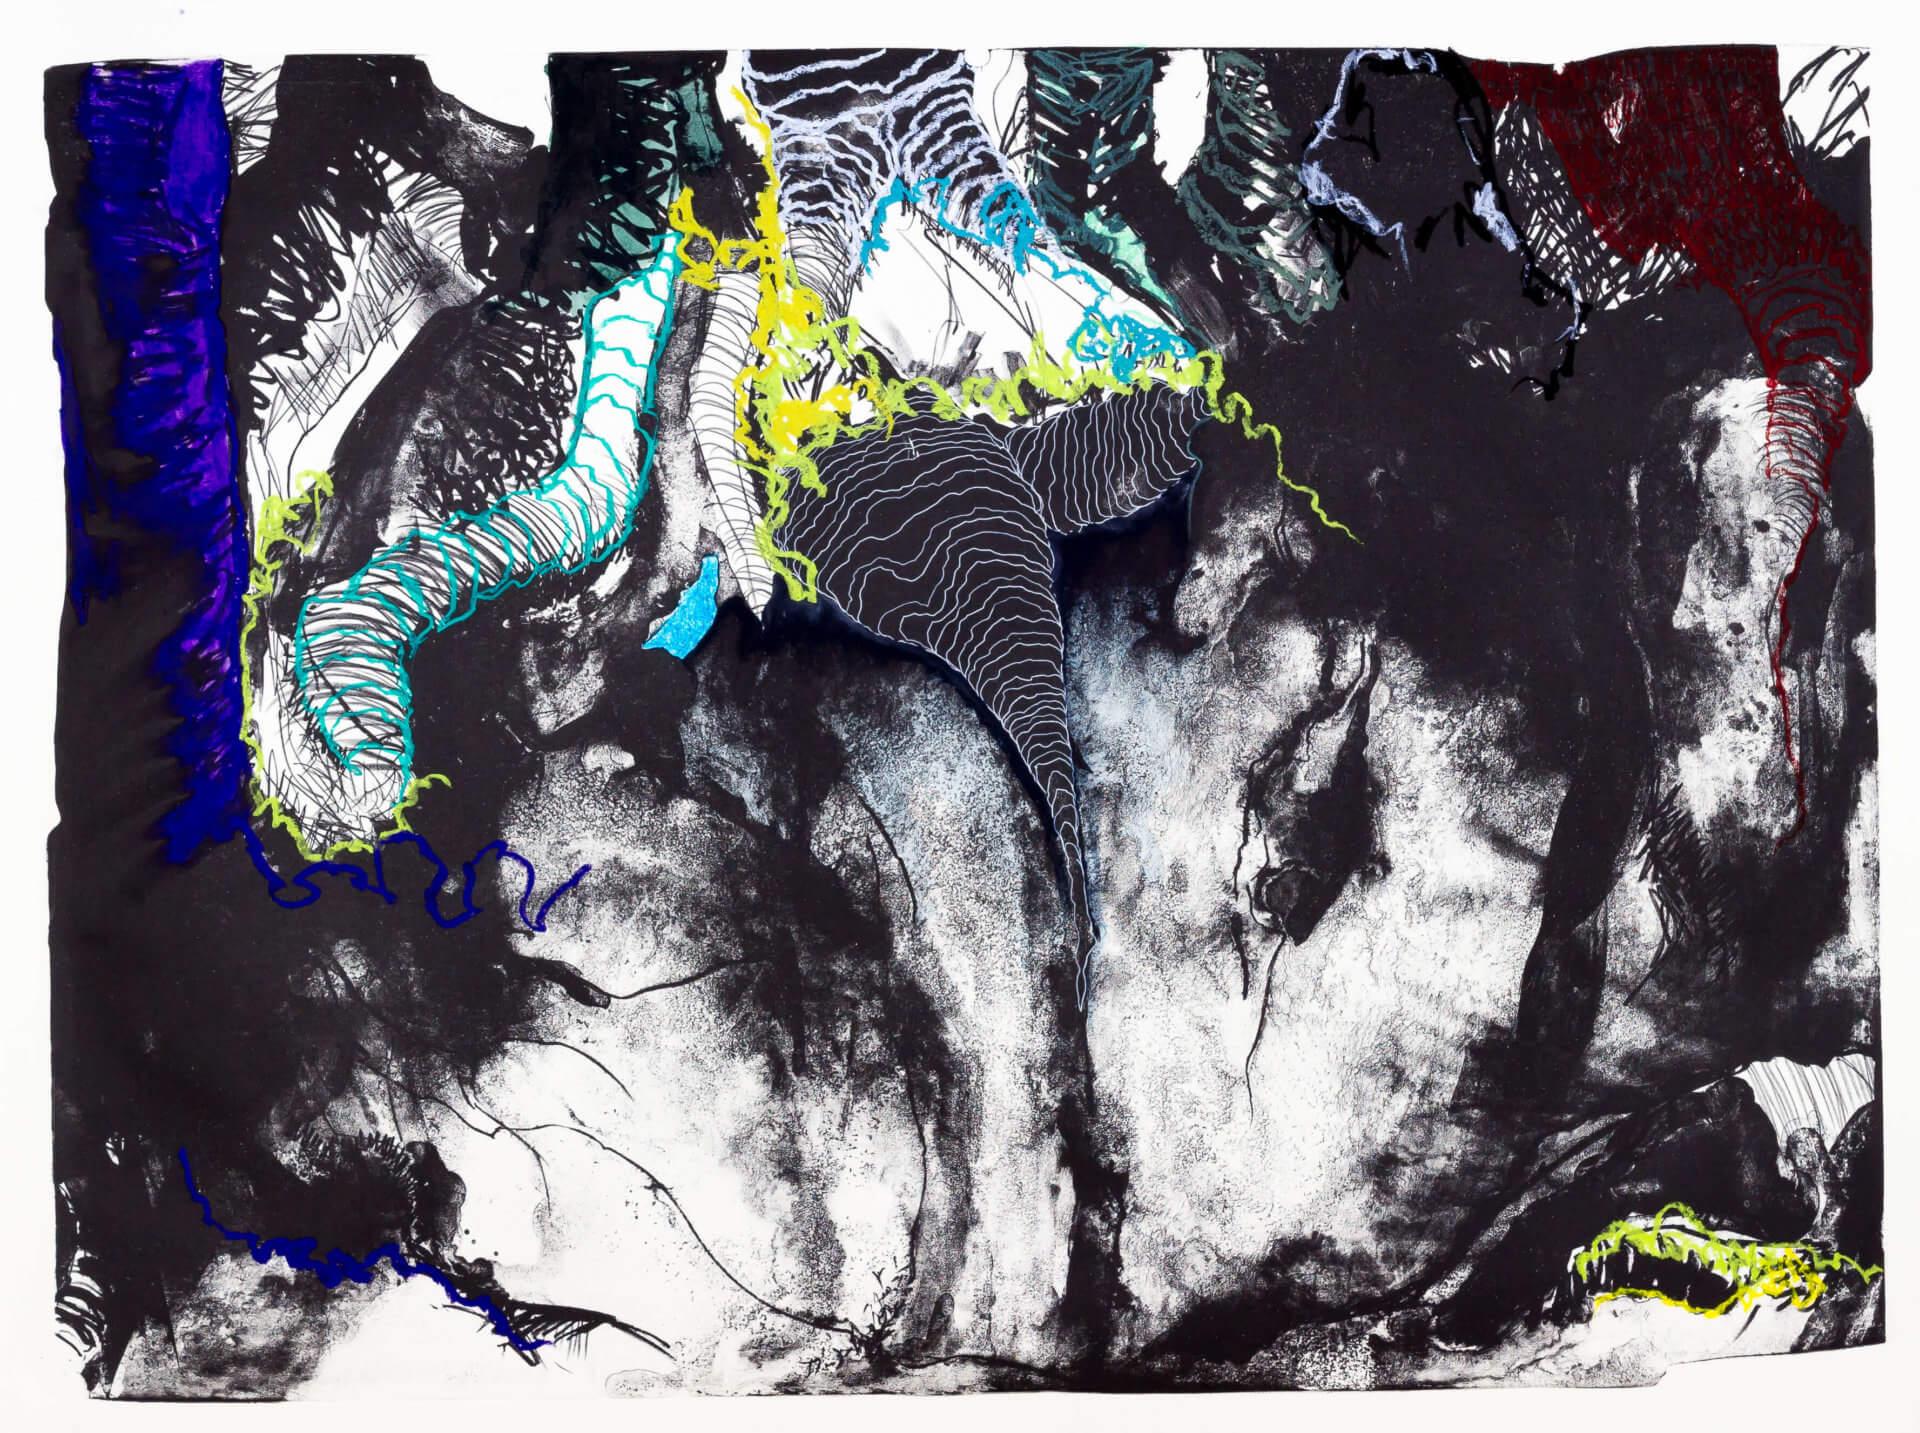 Katharina Albers, Wald (F_B)(A), 2016, Lithographie handkoloriert (Ölkreide, Graphit, Aquarellfarbe, Fineliner, Gelstift, Tusche), Unikat, 70×100 cm